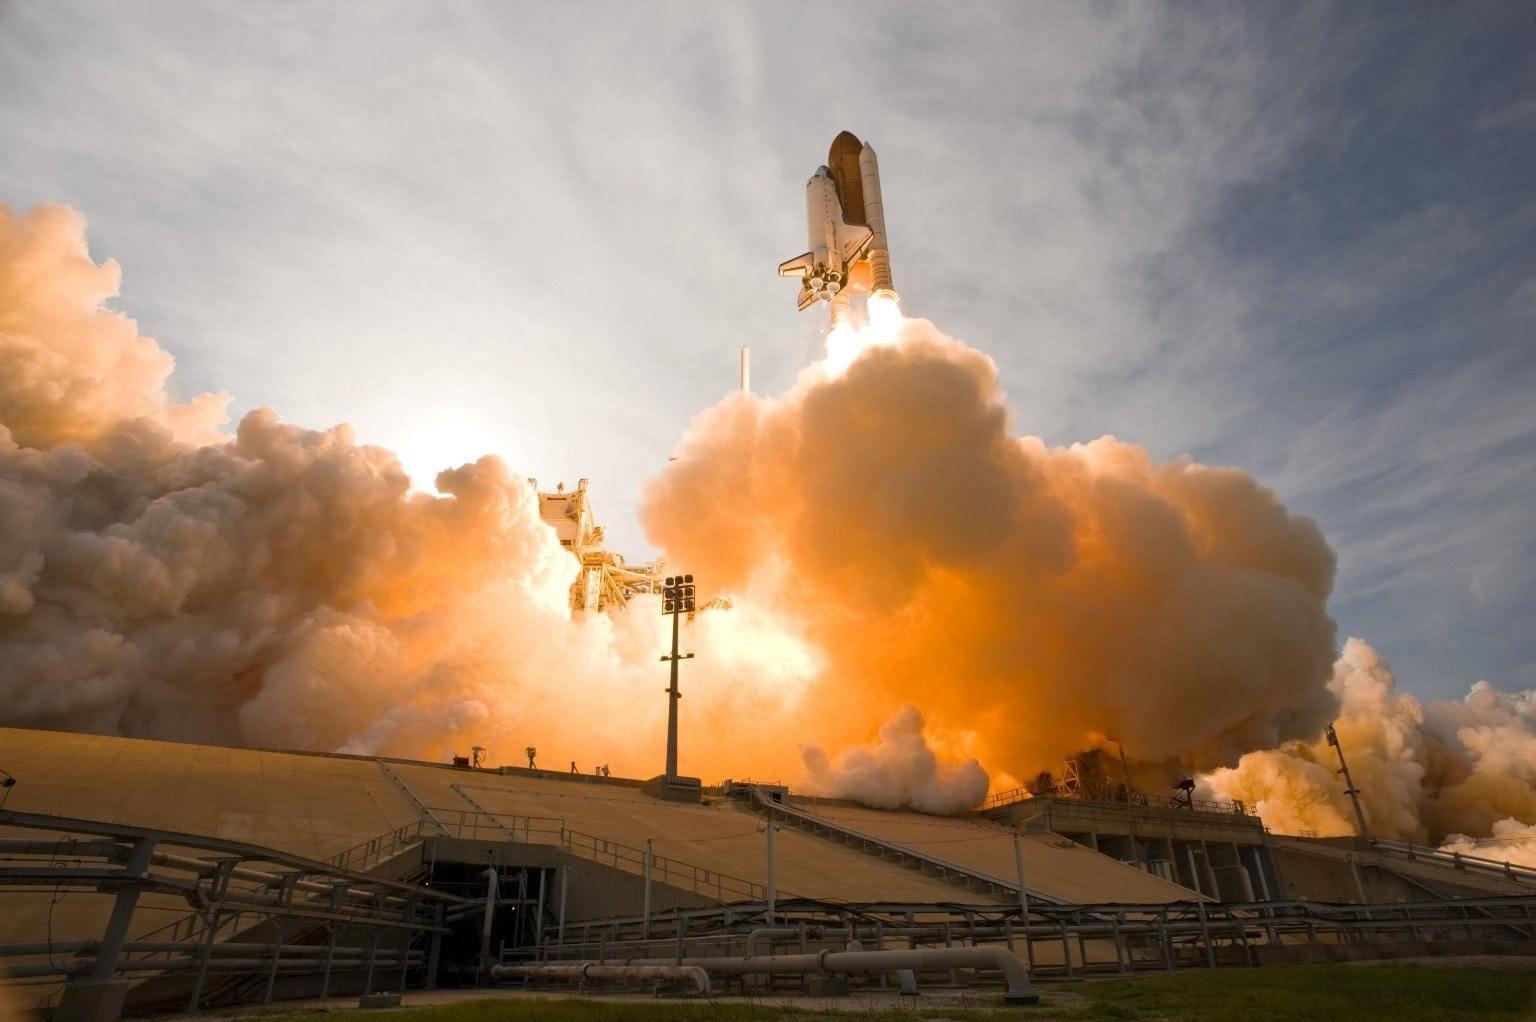 Aerospace engineering exploration launch pexels